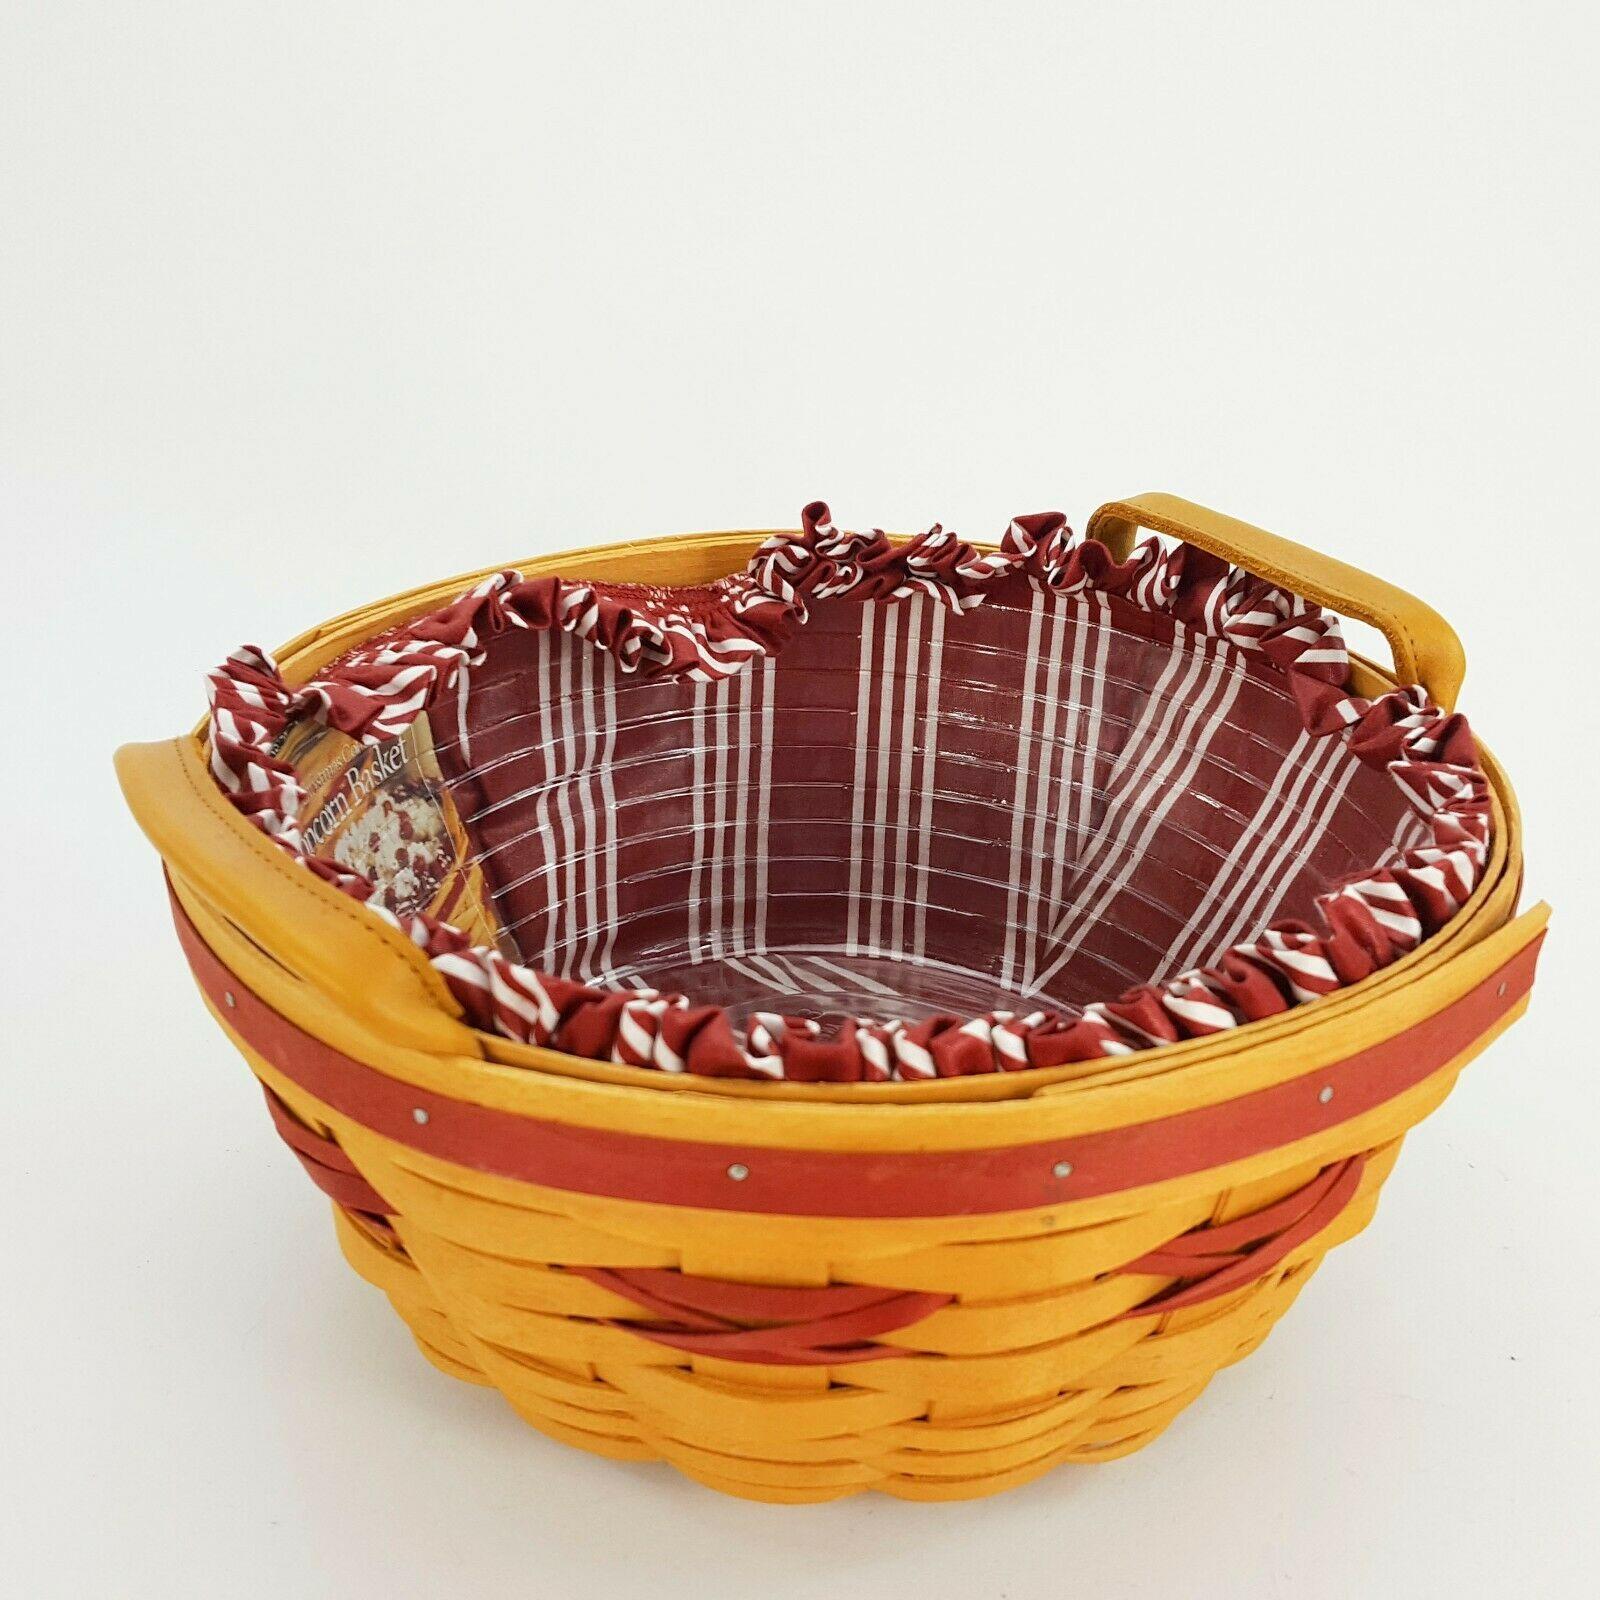 Longaberger 1999 Christmas Popcorn Basket w Protector & Red White Liner 15156 image 7